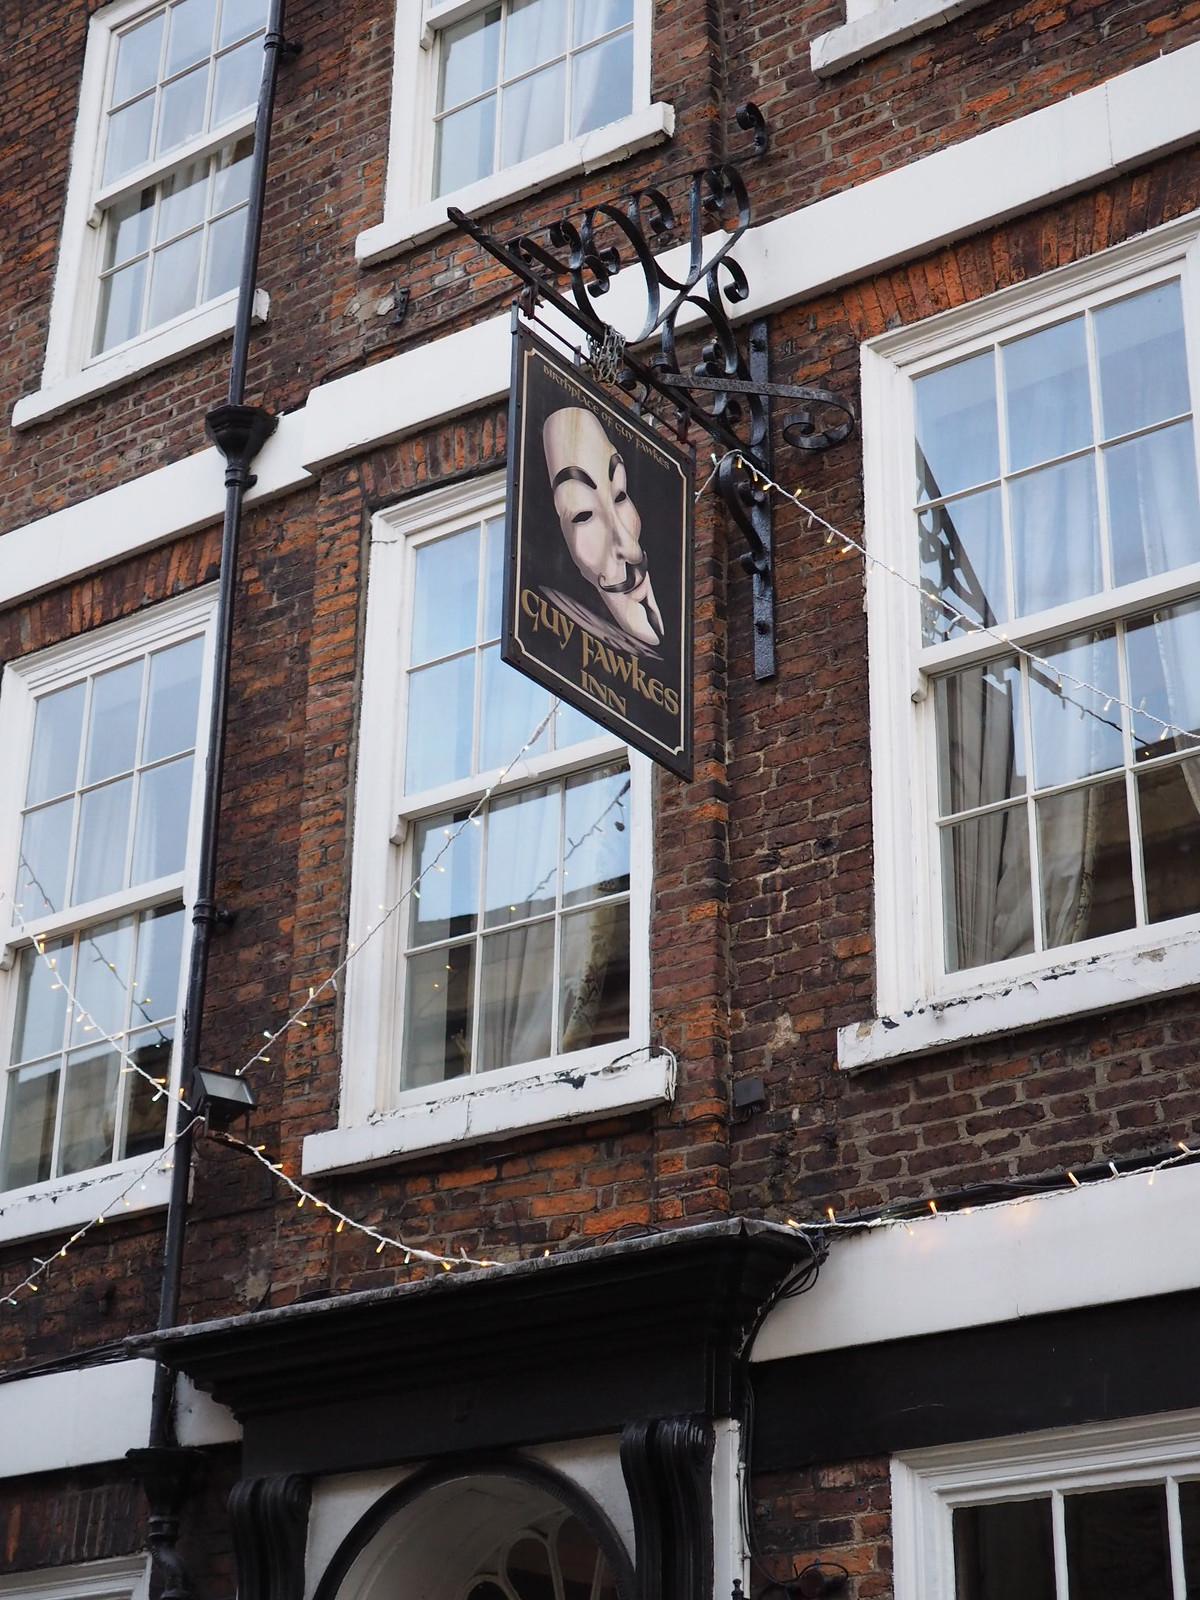 Guy Fawkes Inn